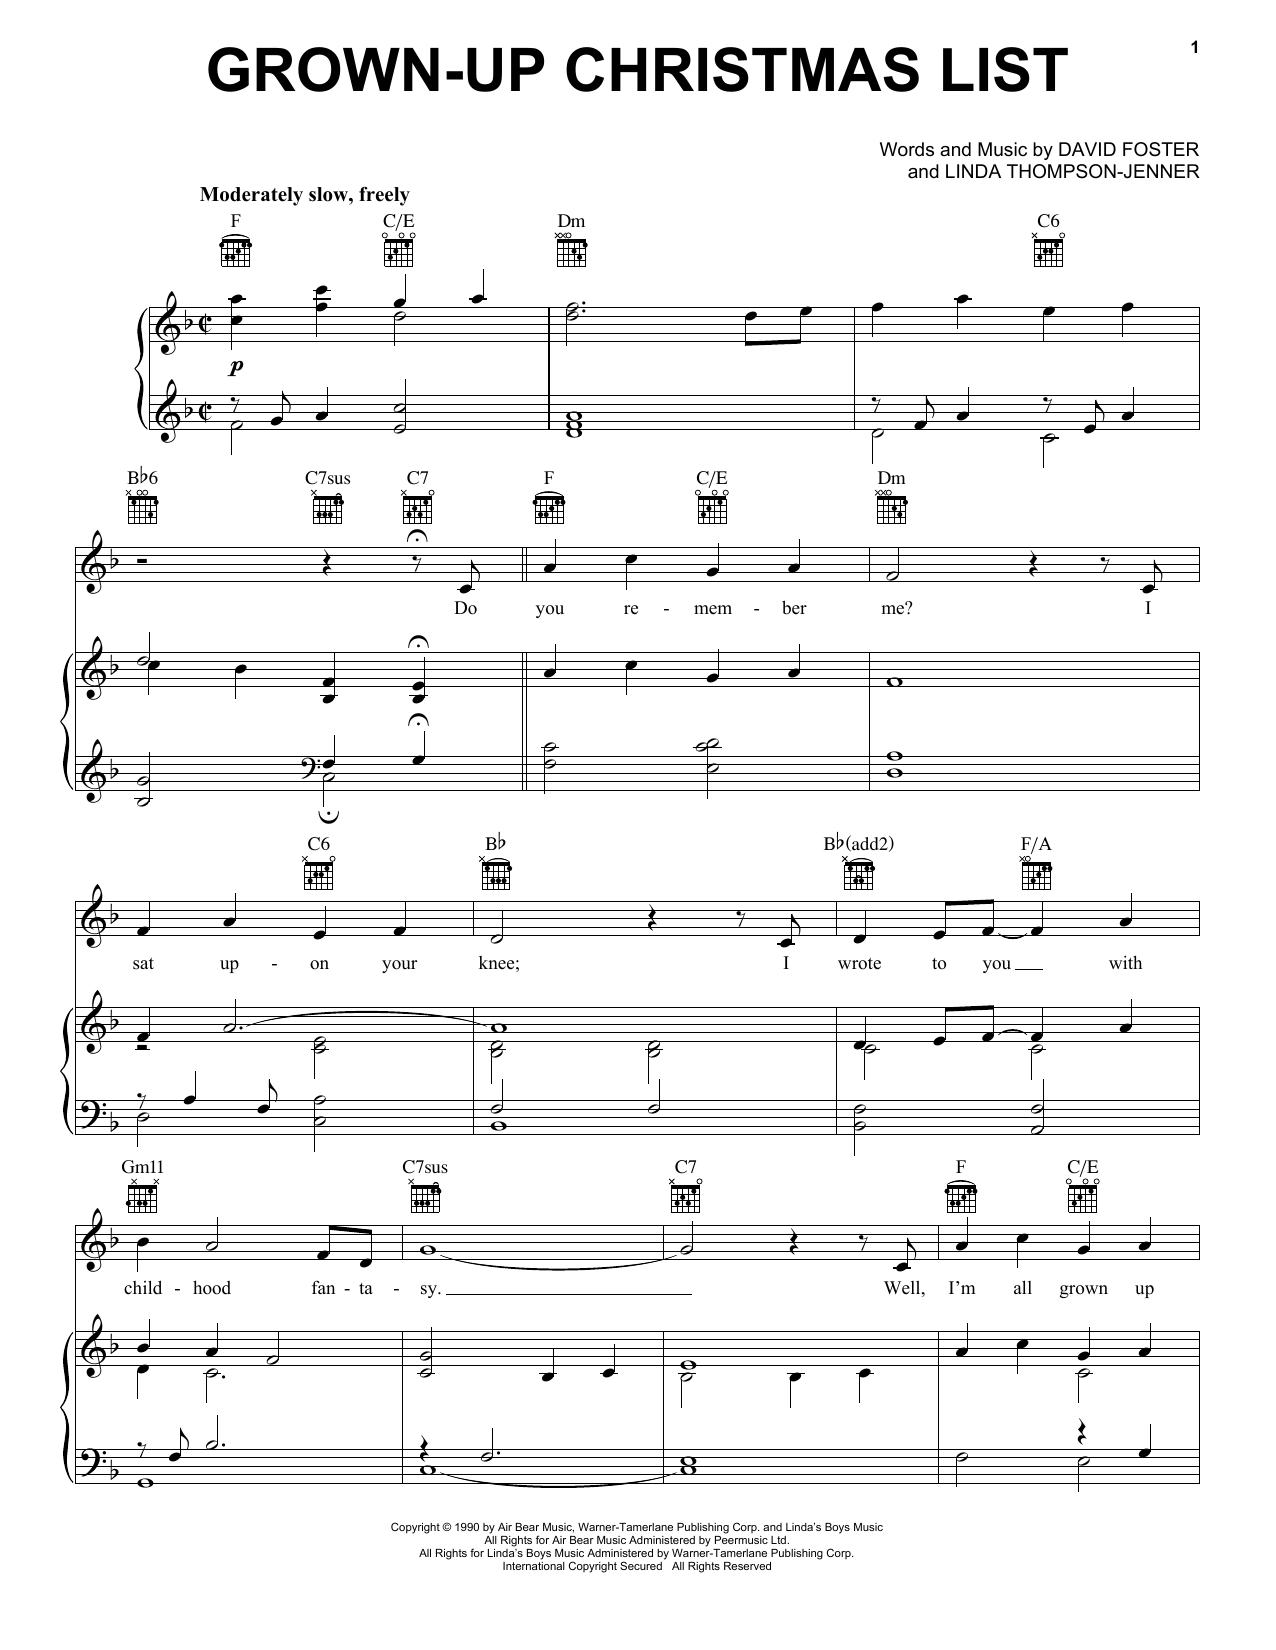 Grown-Up Christmas List (Vocal Pro + Piano/Guitar) - Print Sheet Music